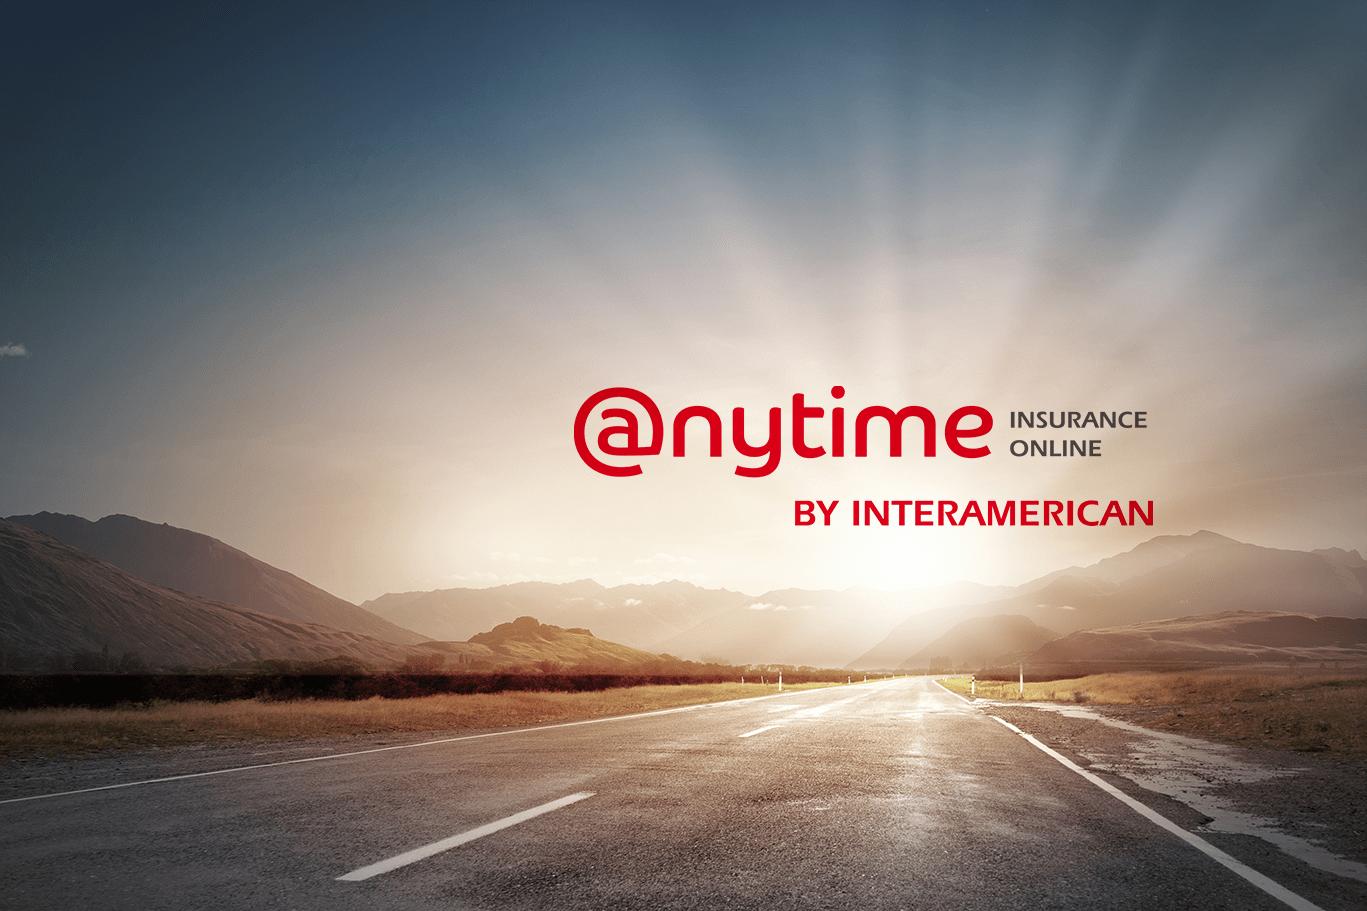 O καιρός στο Οδικό Δίκτυο, από το Αστεροσκοπείο Αθηνών/Meteo.gr σε συνεργασία με την Anytime